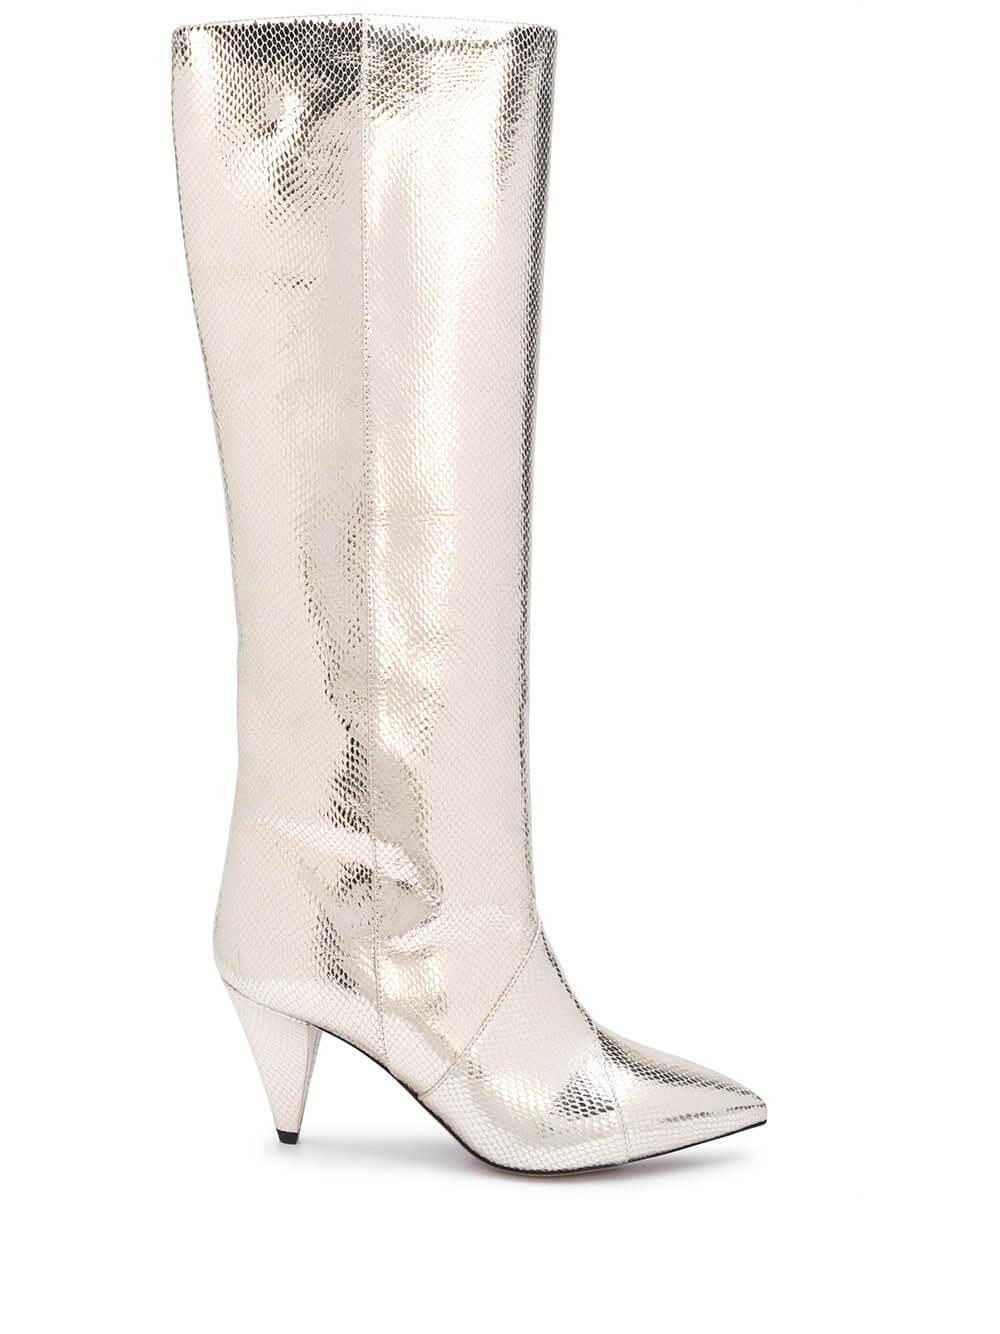 Metallic Tall High Heel Boot